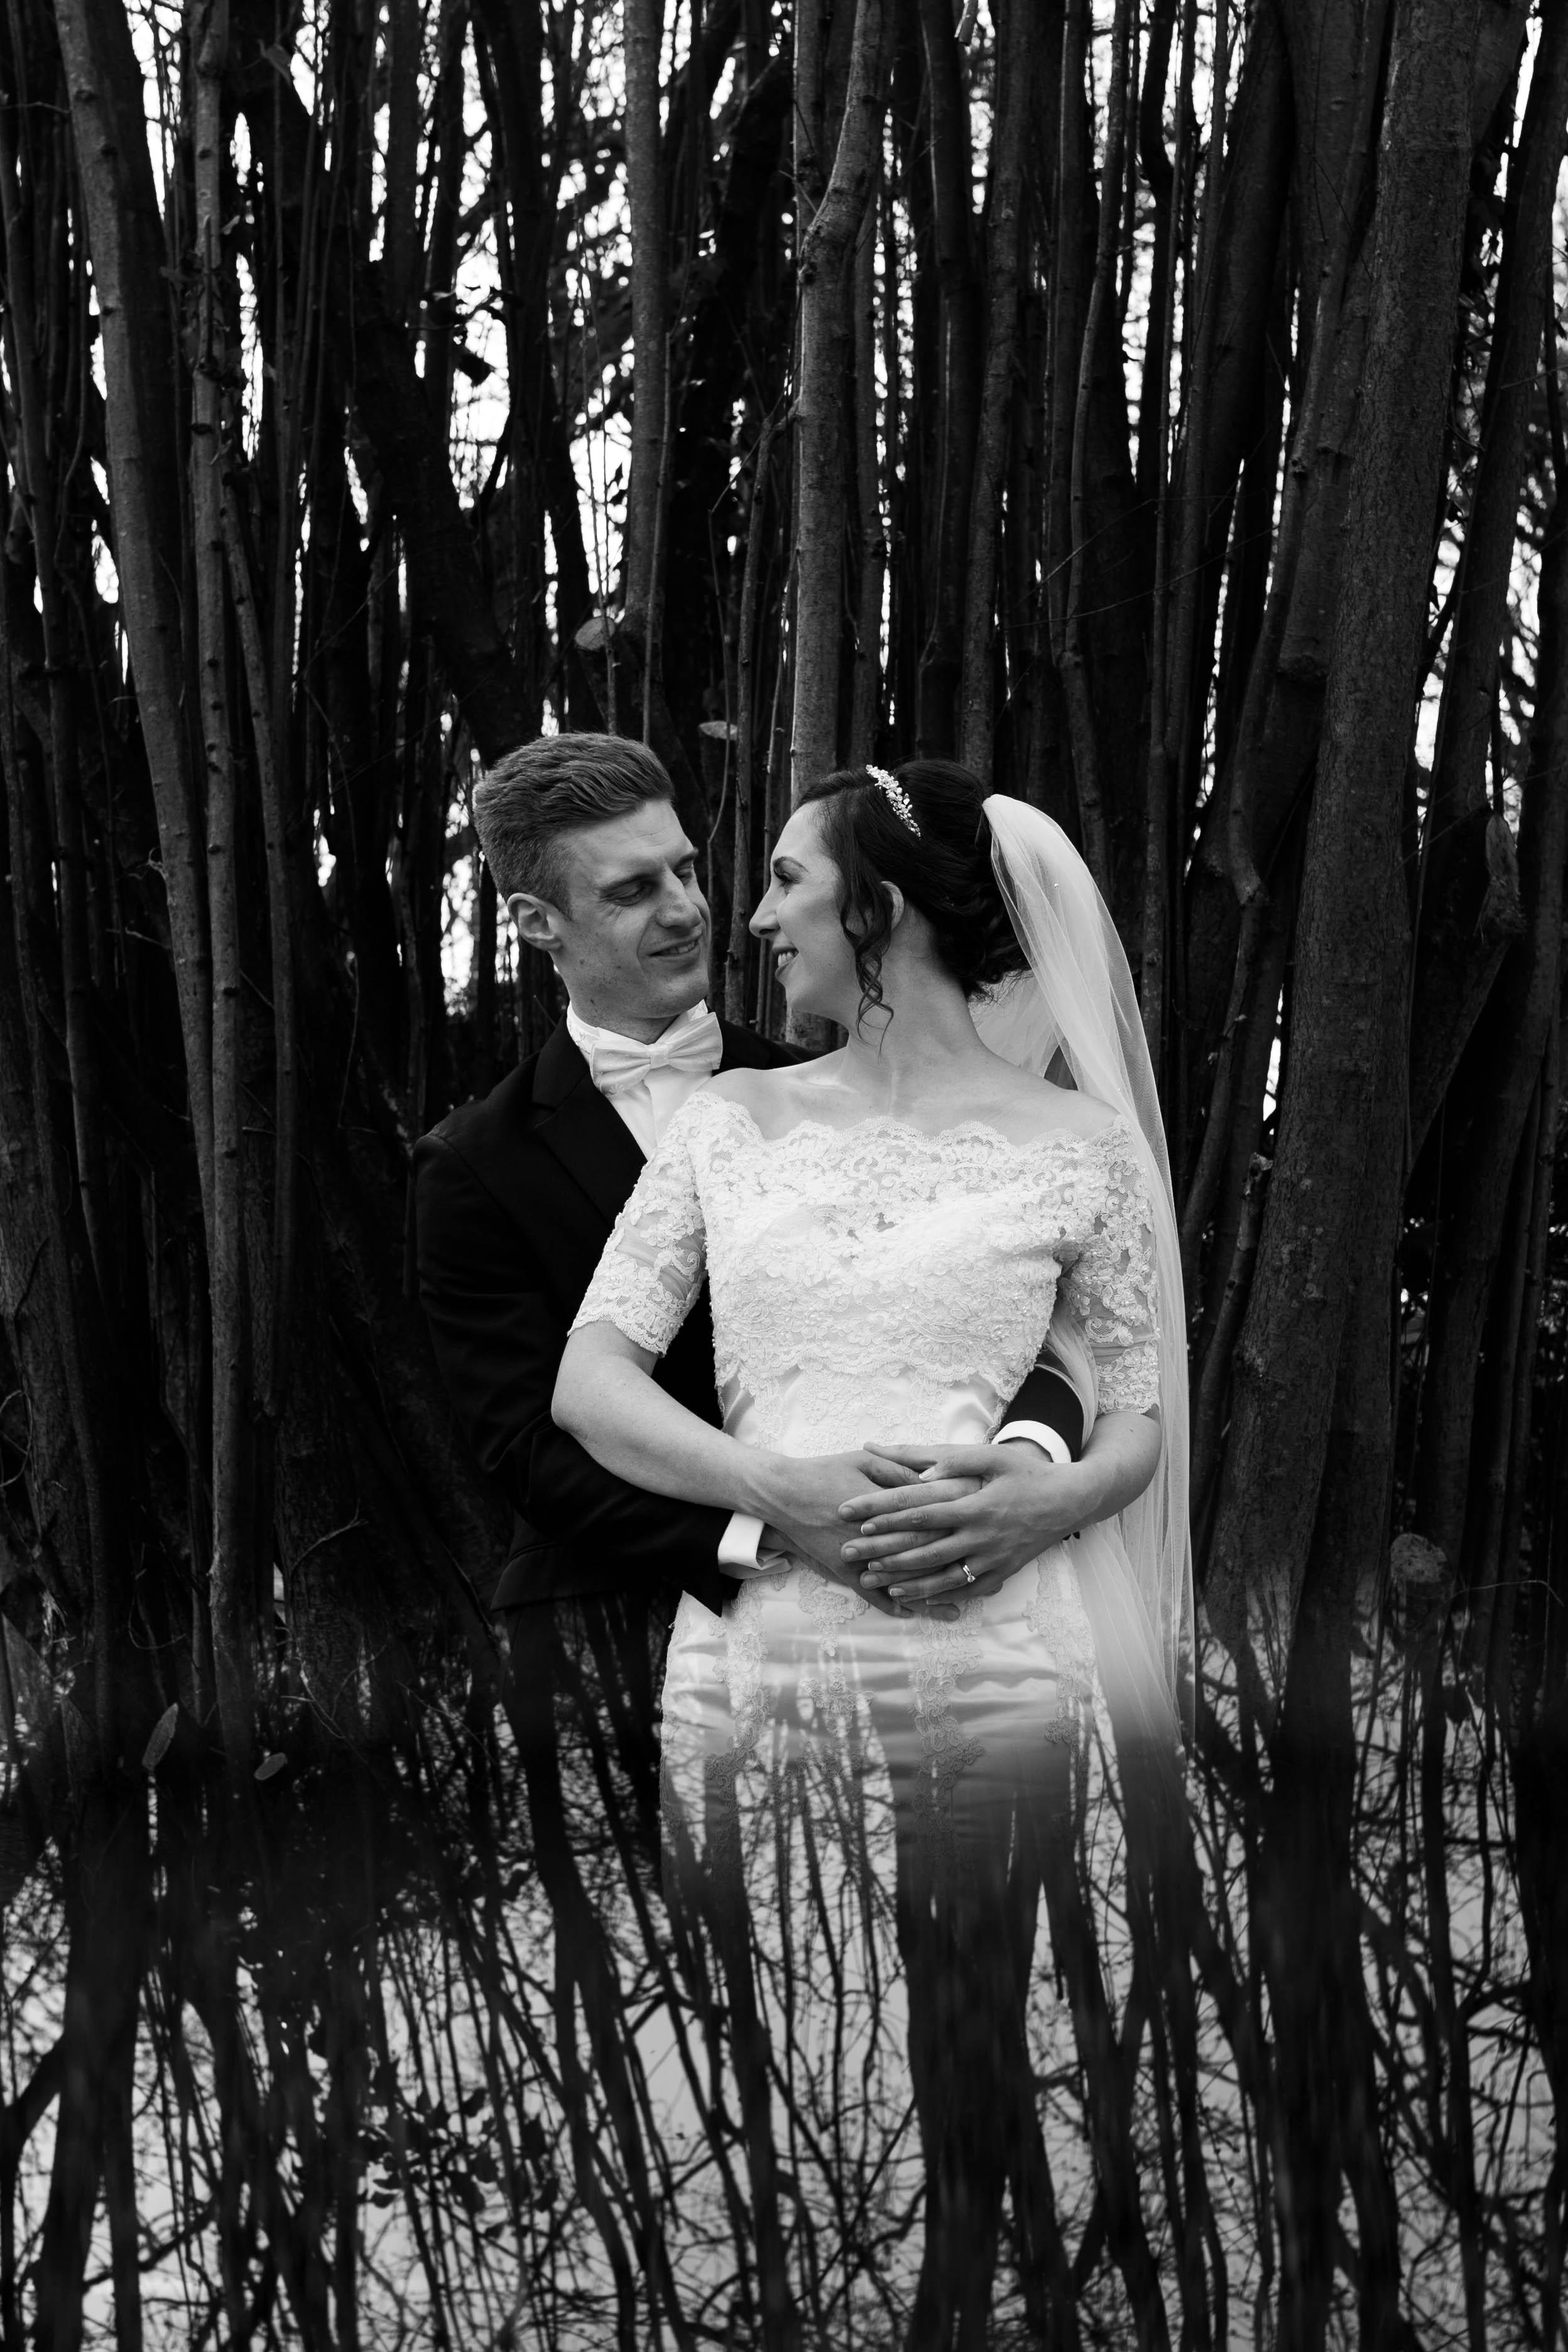 Notley_Abbey_Nick_Labrum_Photo_Kate&Matt_black and white-393.jpg